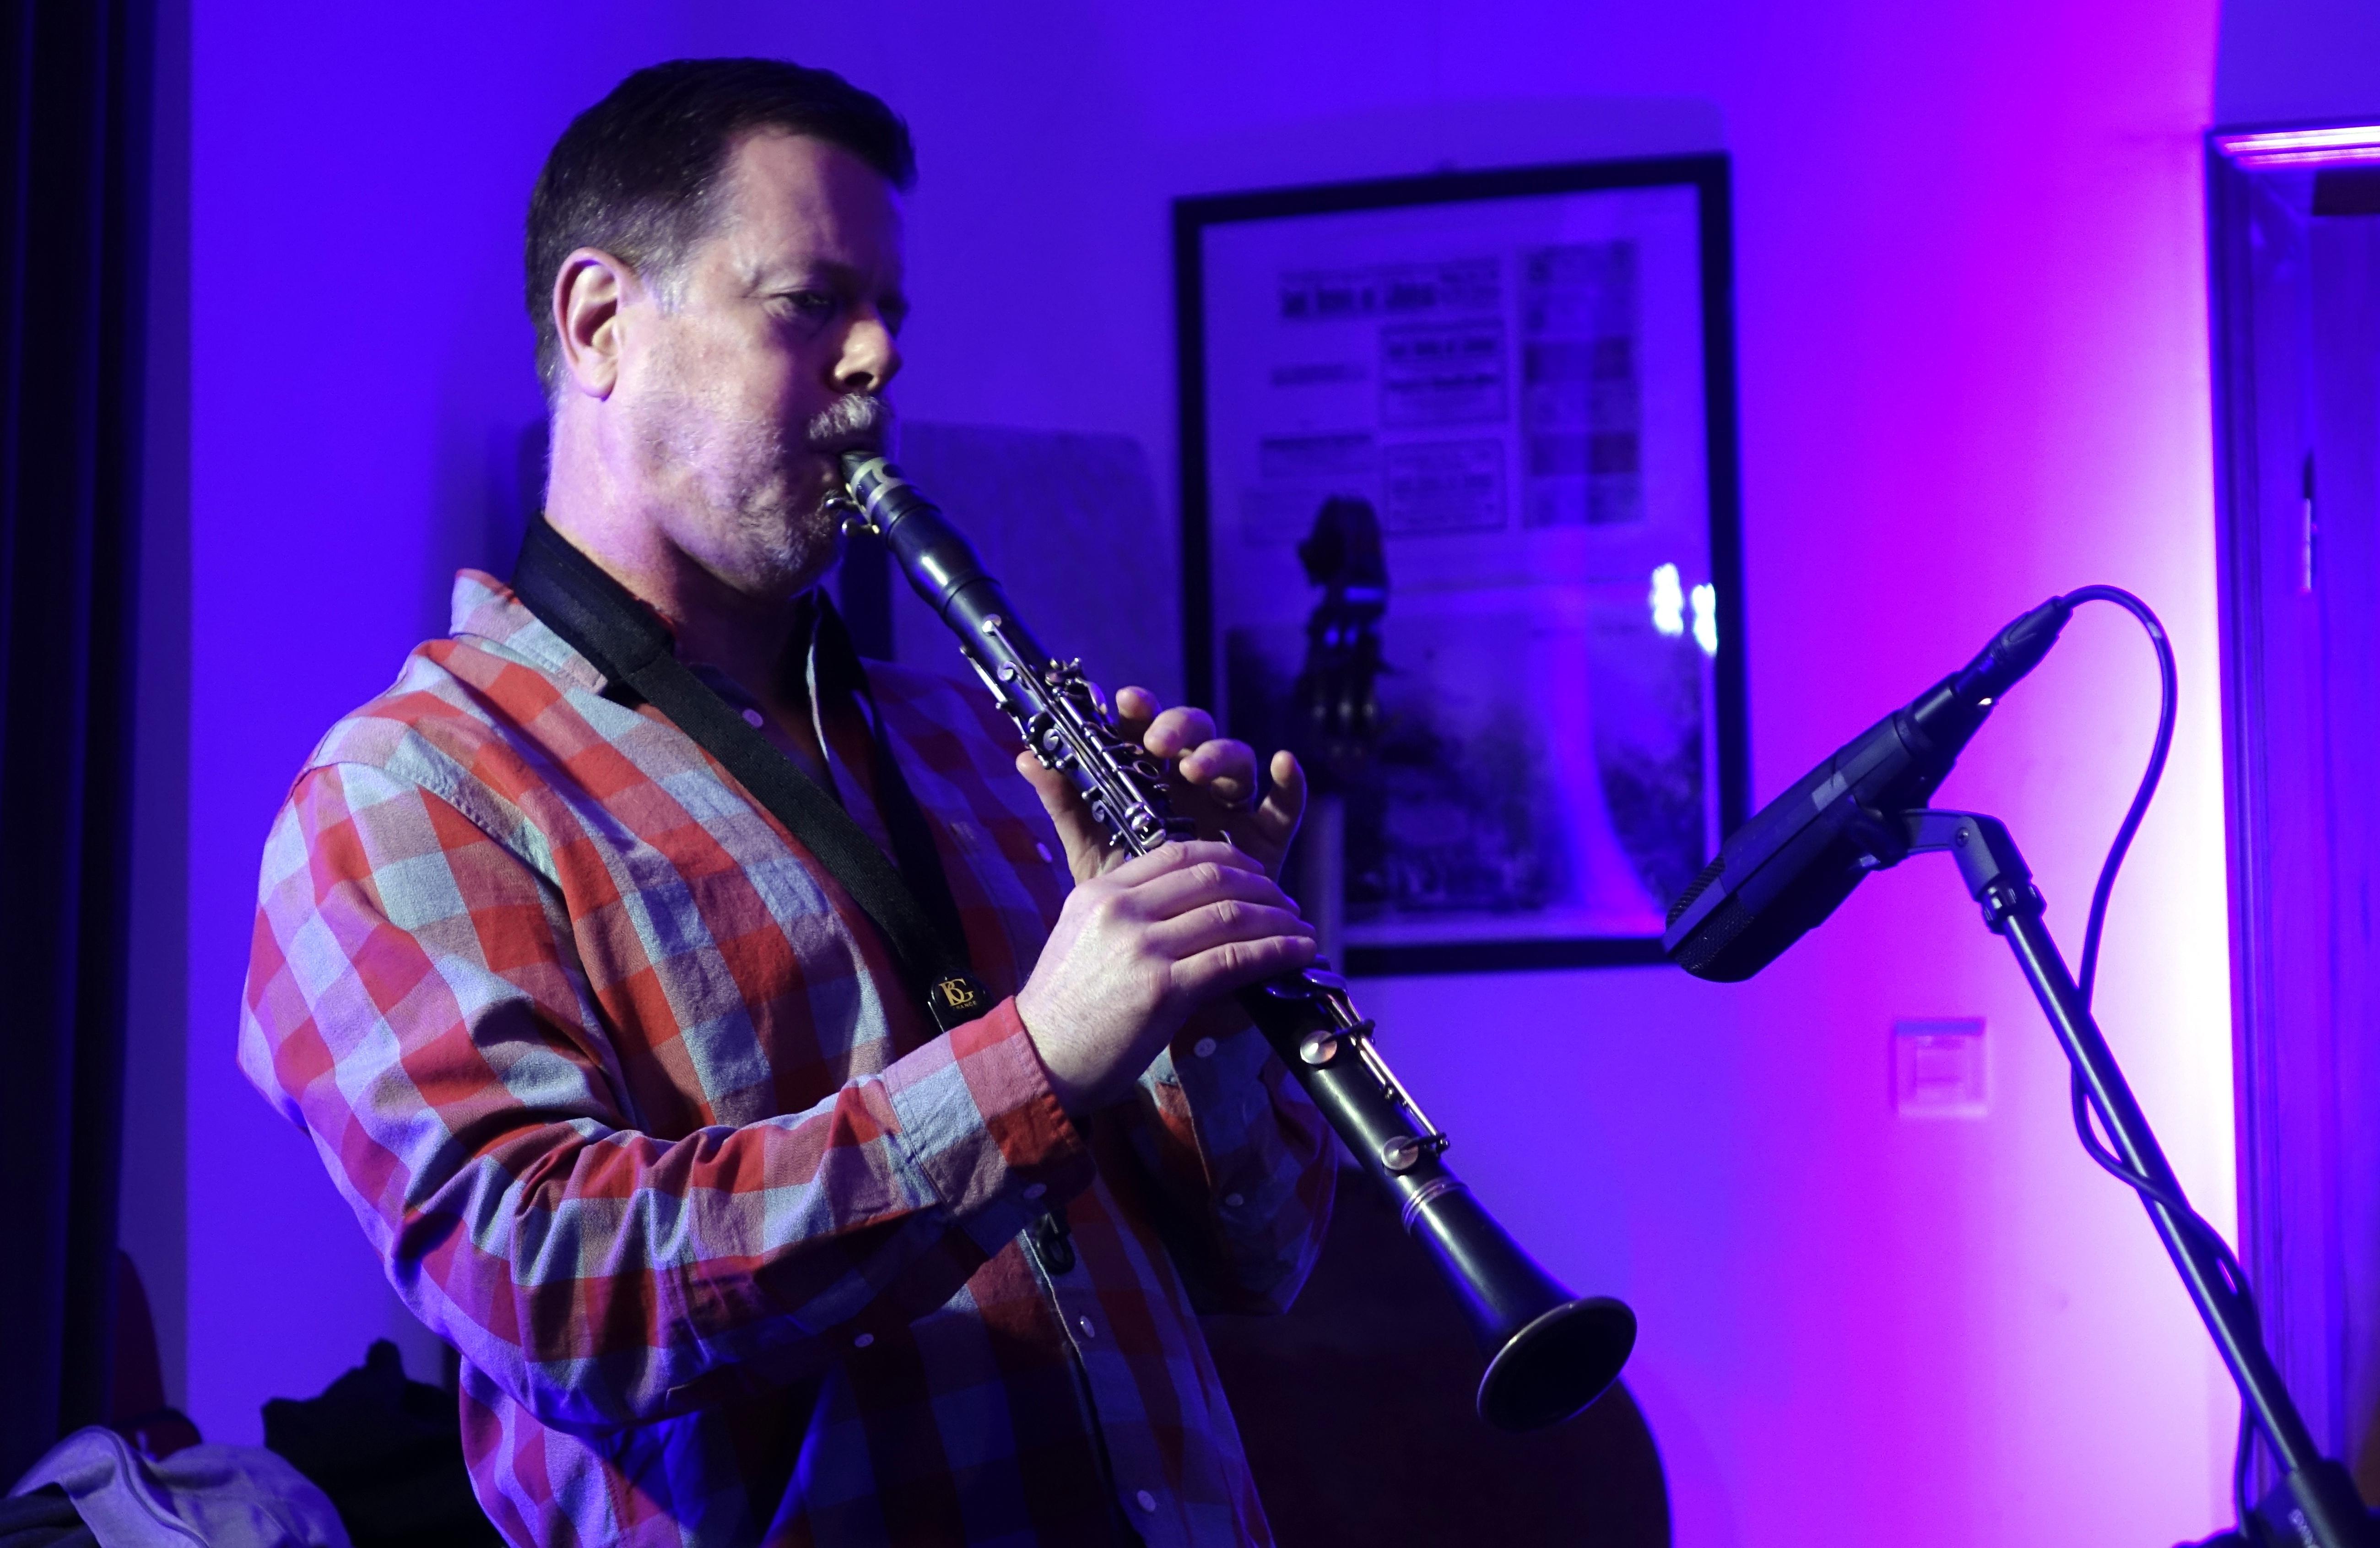 Ken Vandermark at Wlen, Poland on 23 September 2018